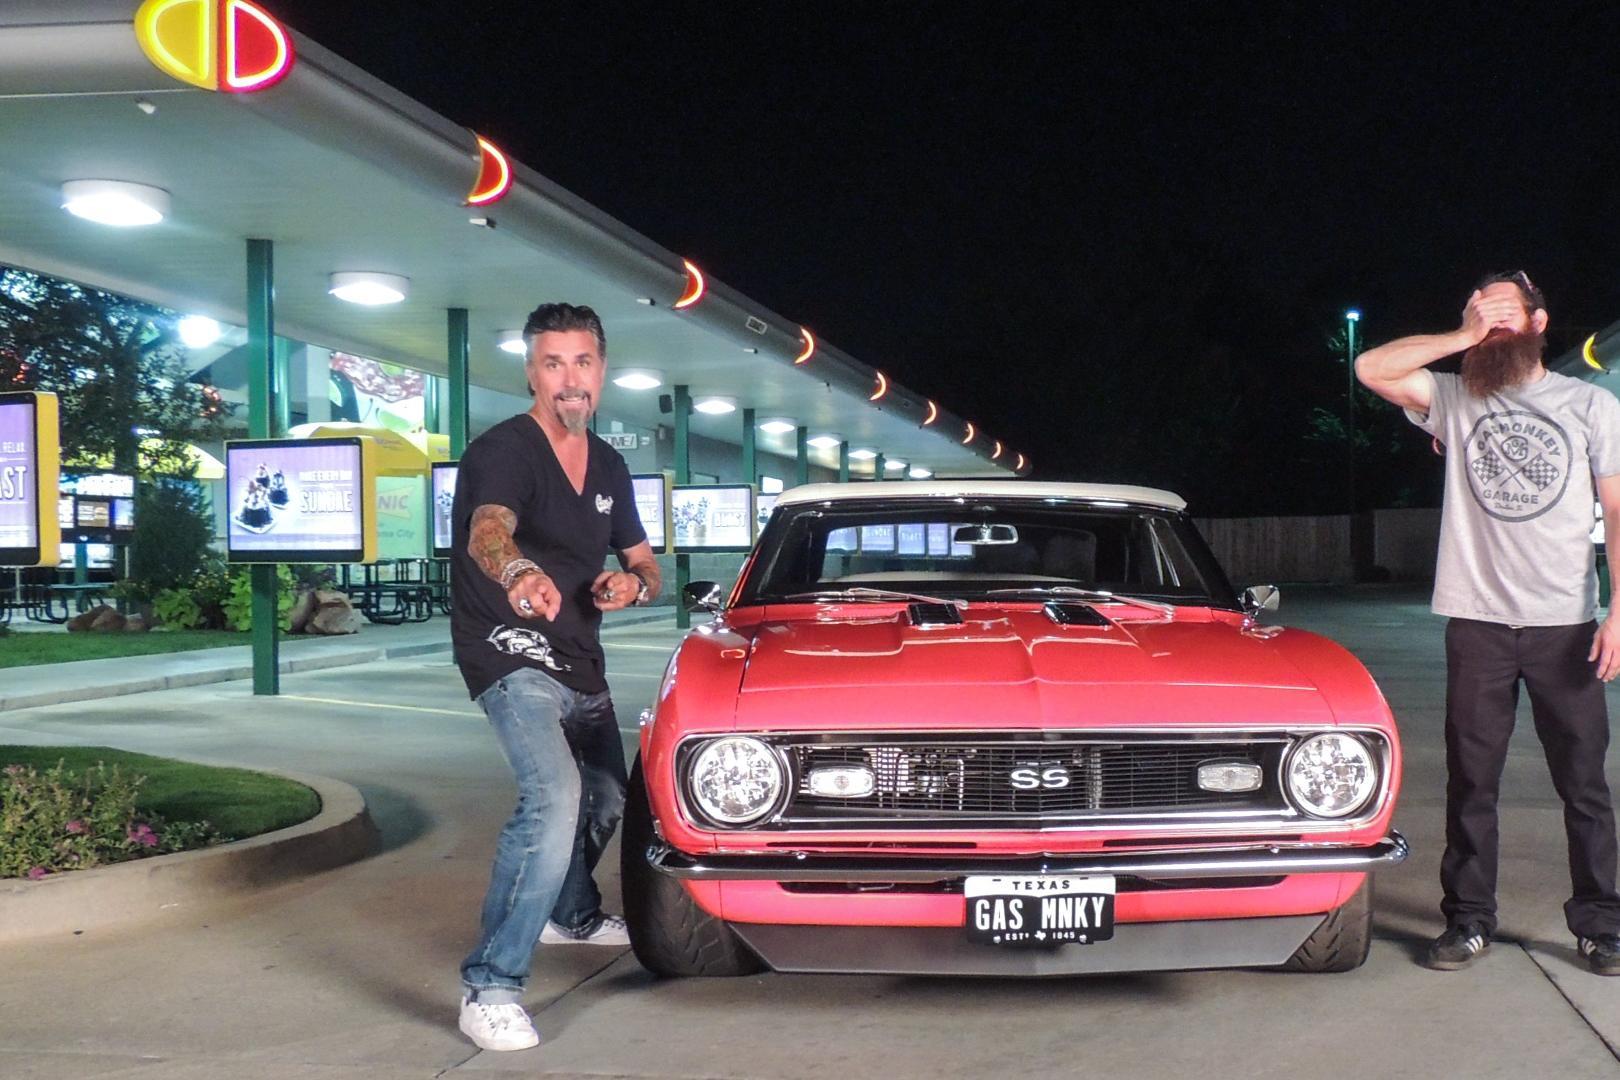 Sonic Car Recap Fast N Loud Discovery - Gas monkey car show